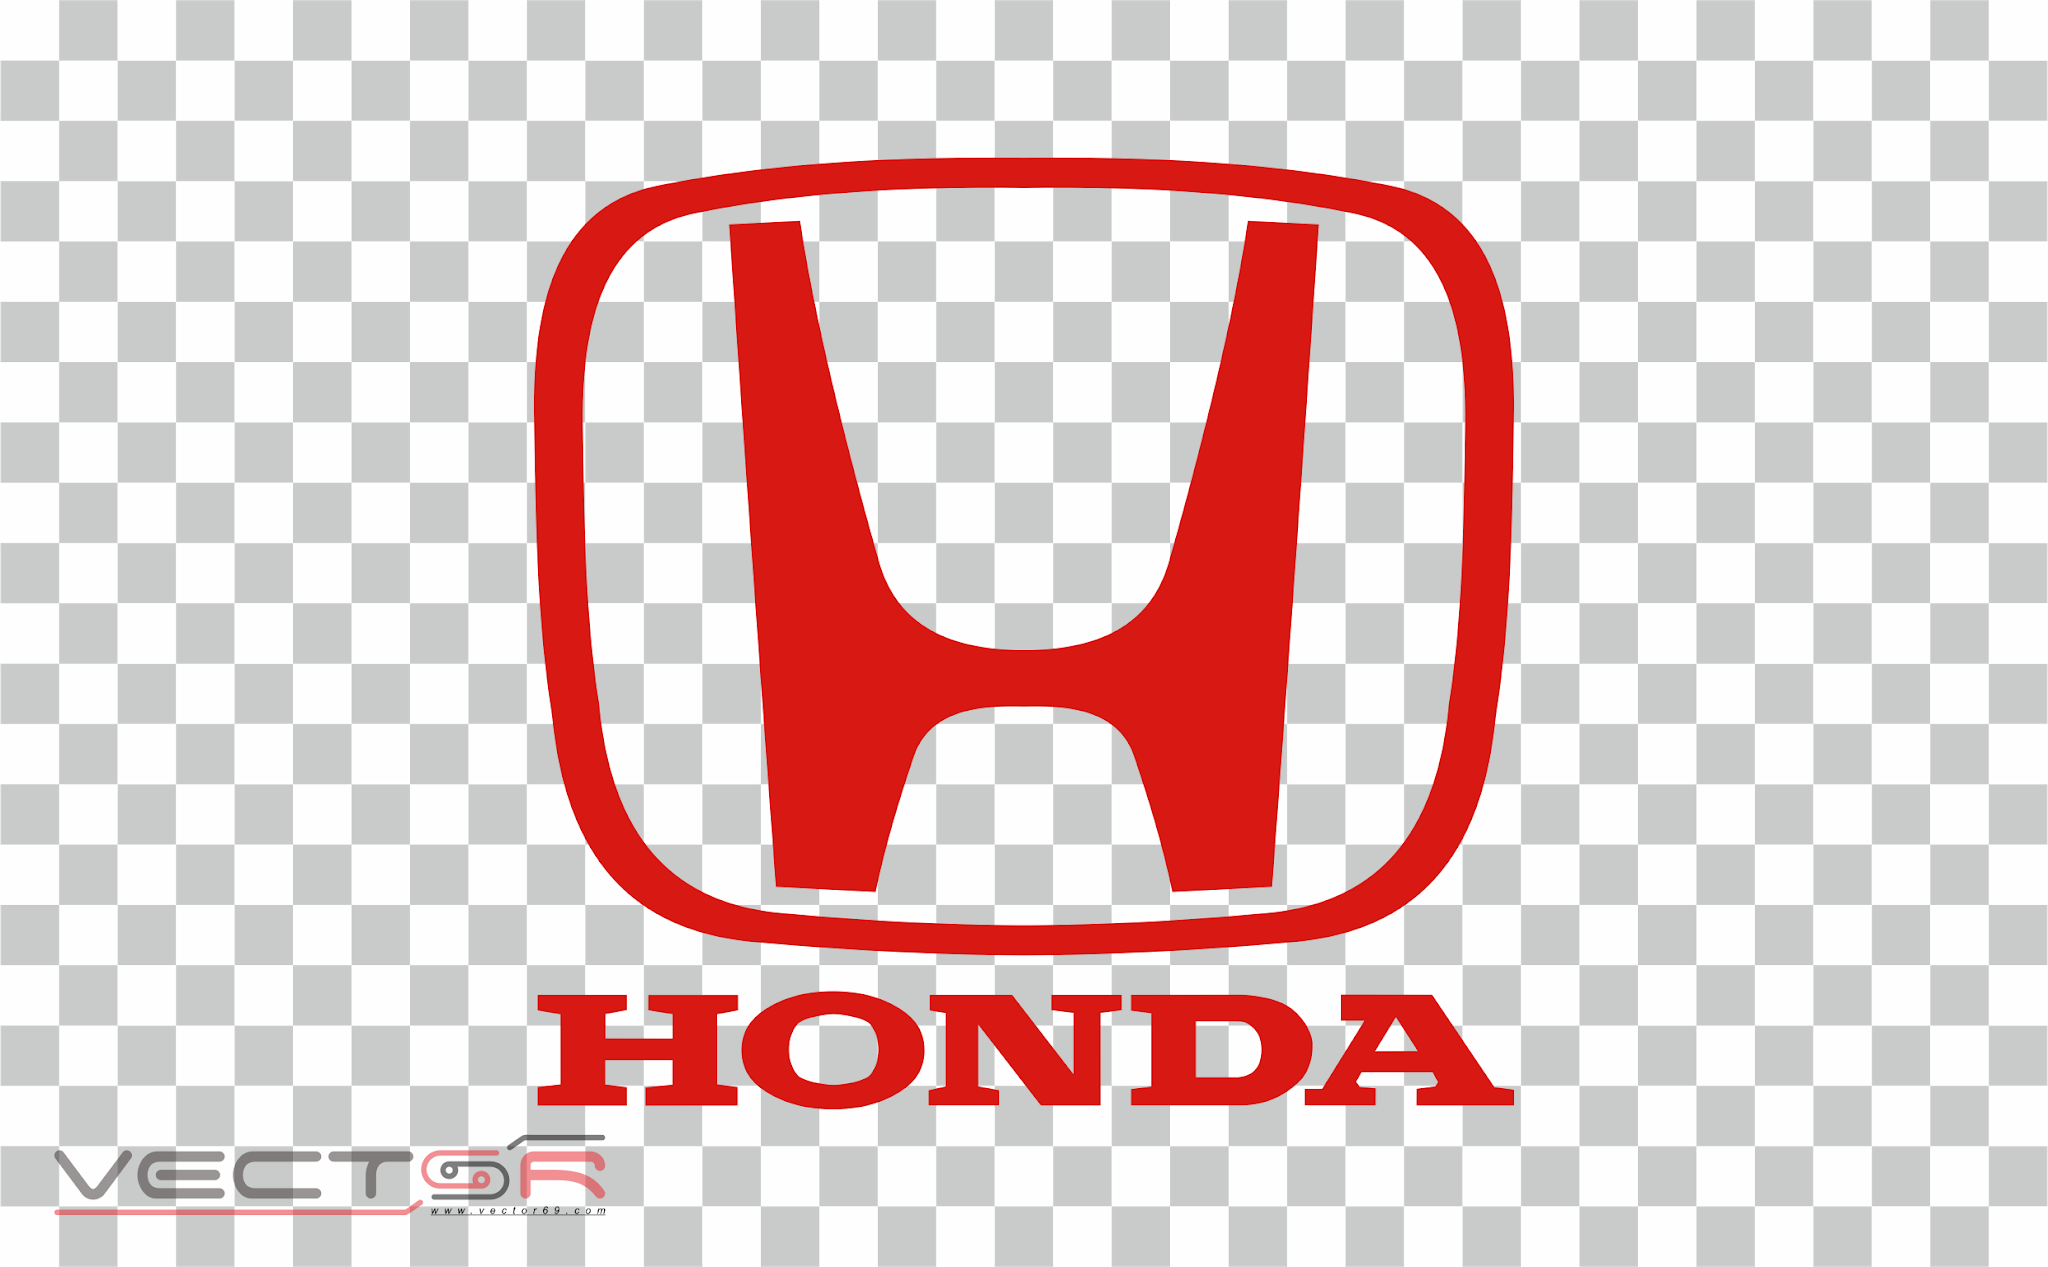 Honda Automobiles Logo - Download Vector File PNG (Portable Network Graphics)